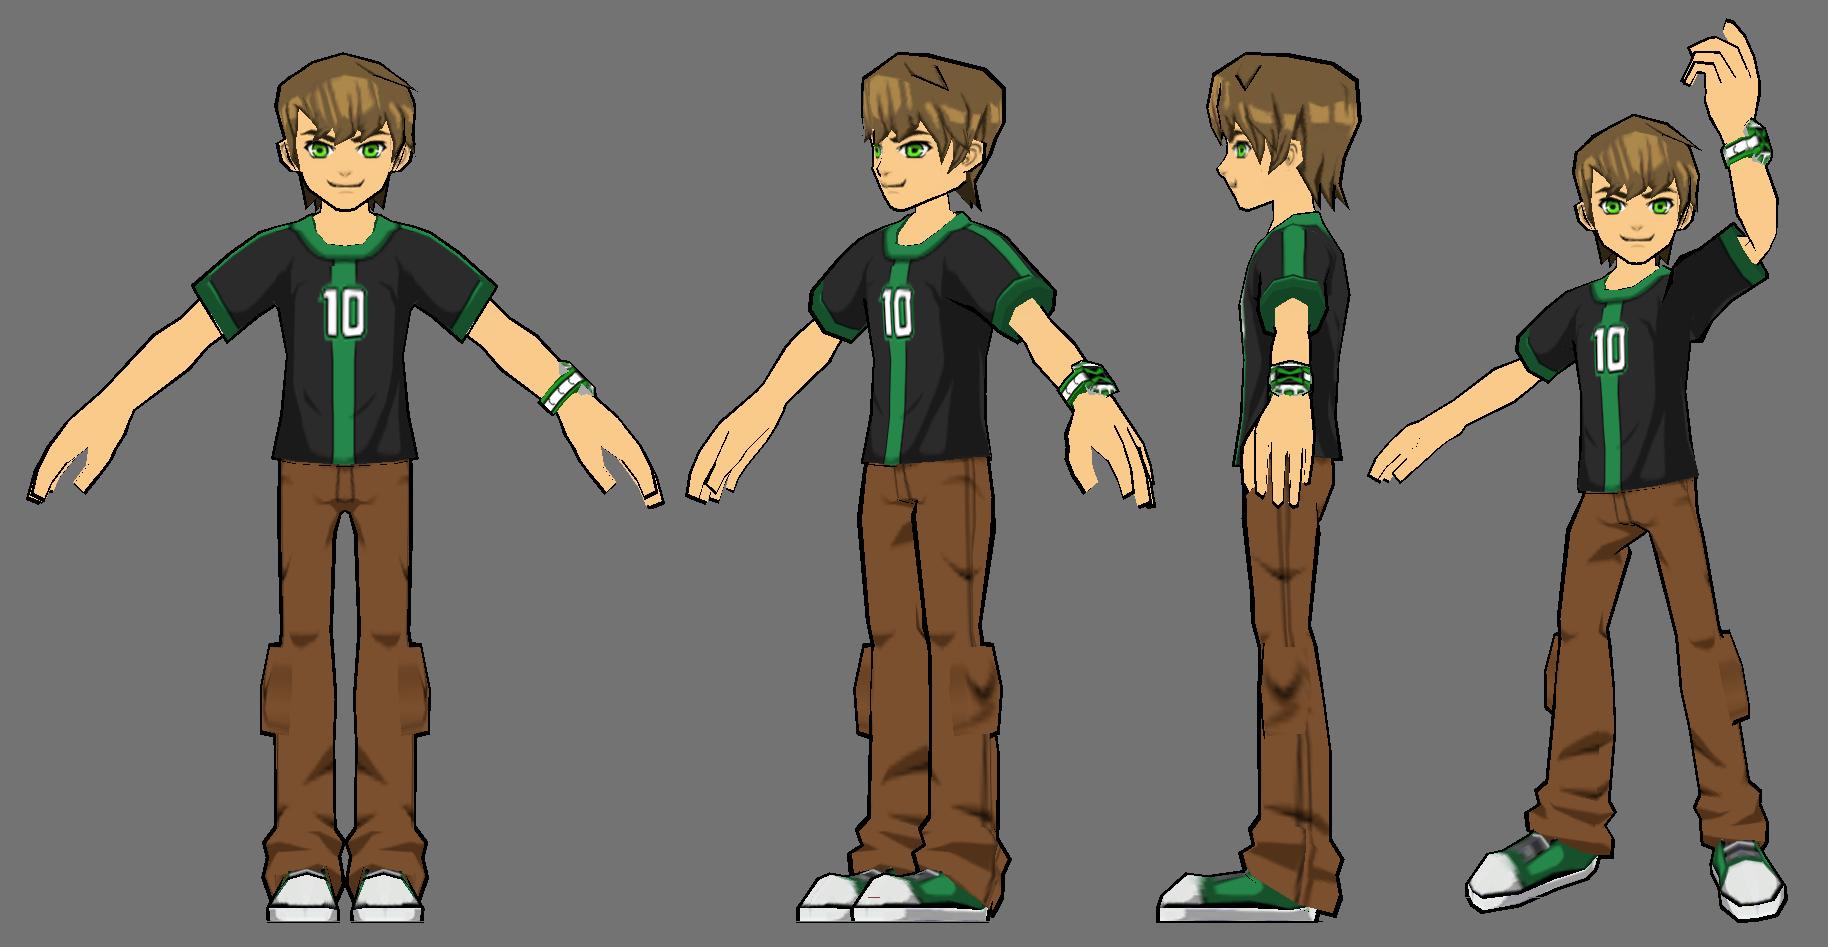 Ben 10: Omniverse Teen Ben Model by FusionFallCreations